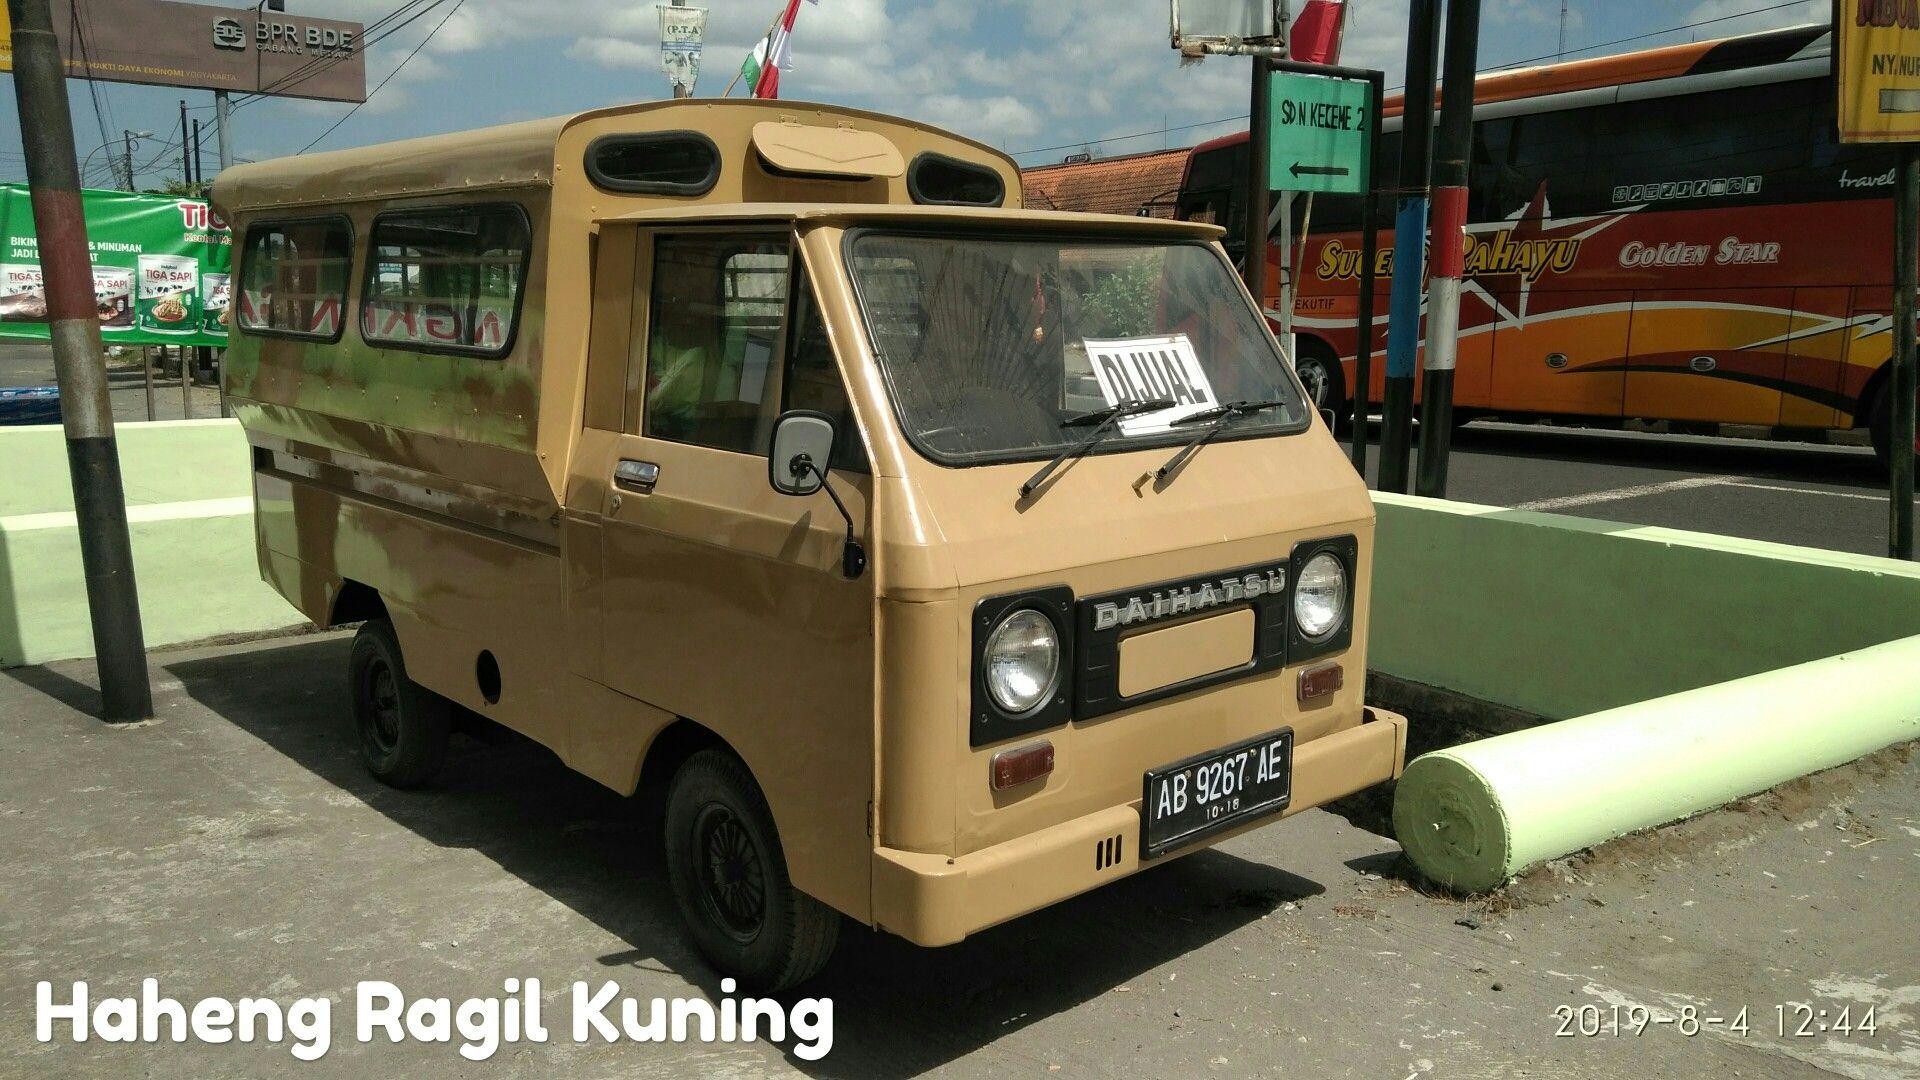 Pin Oleh Ekka Rolla Di Daihatsu Daihatsu Indonesia Kuning